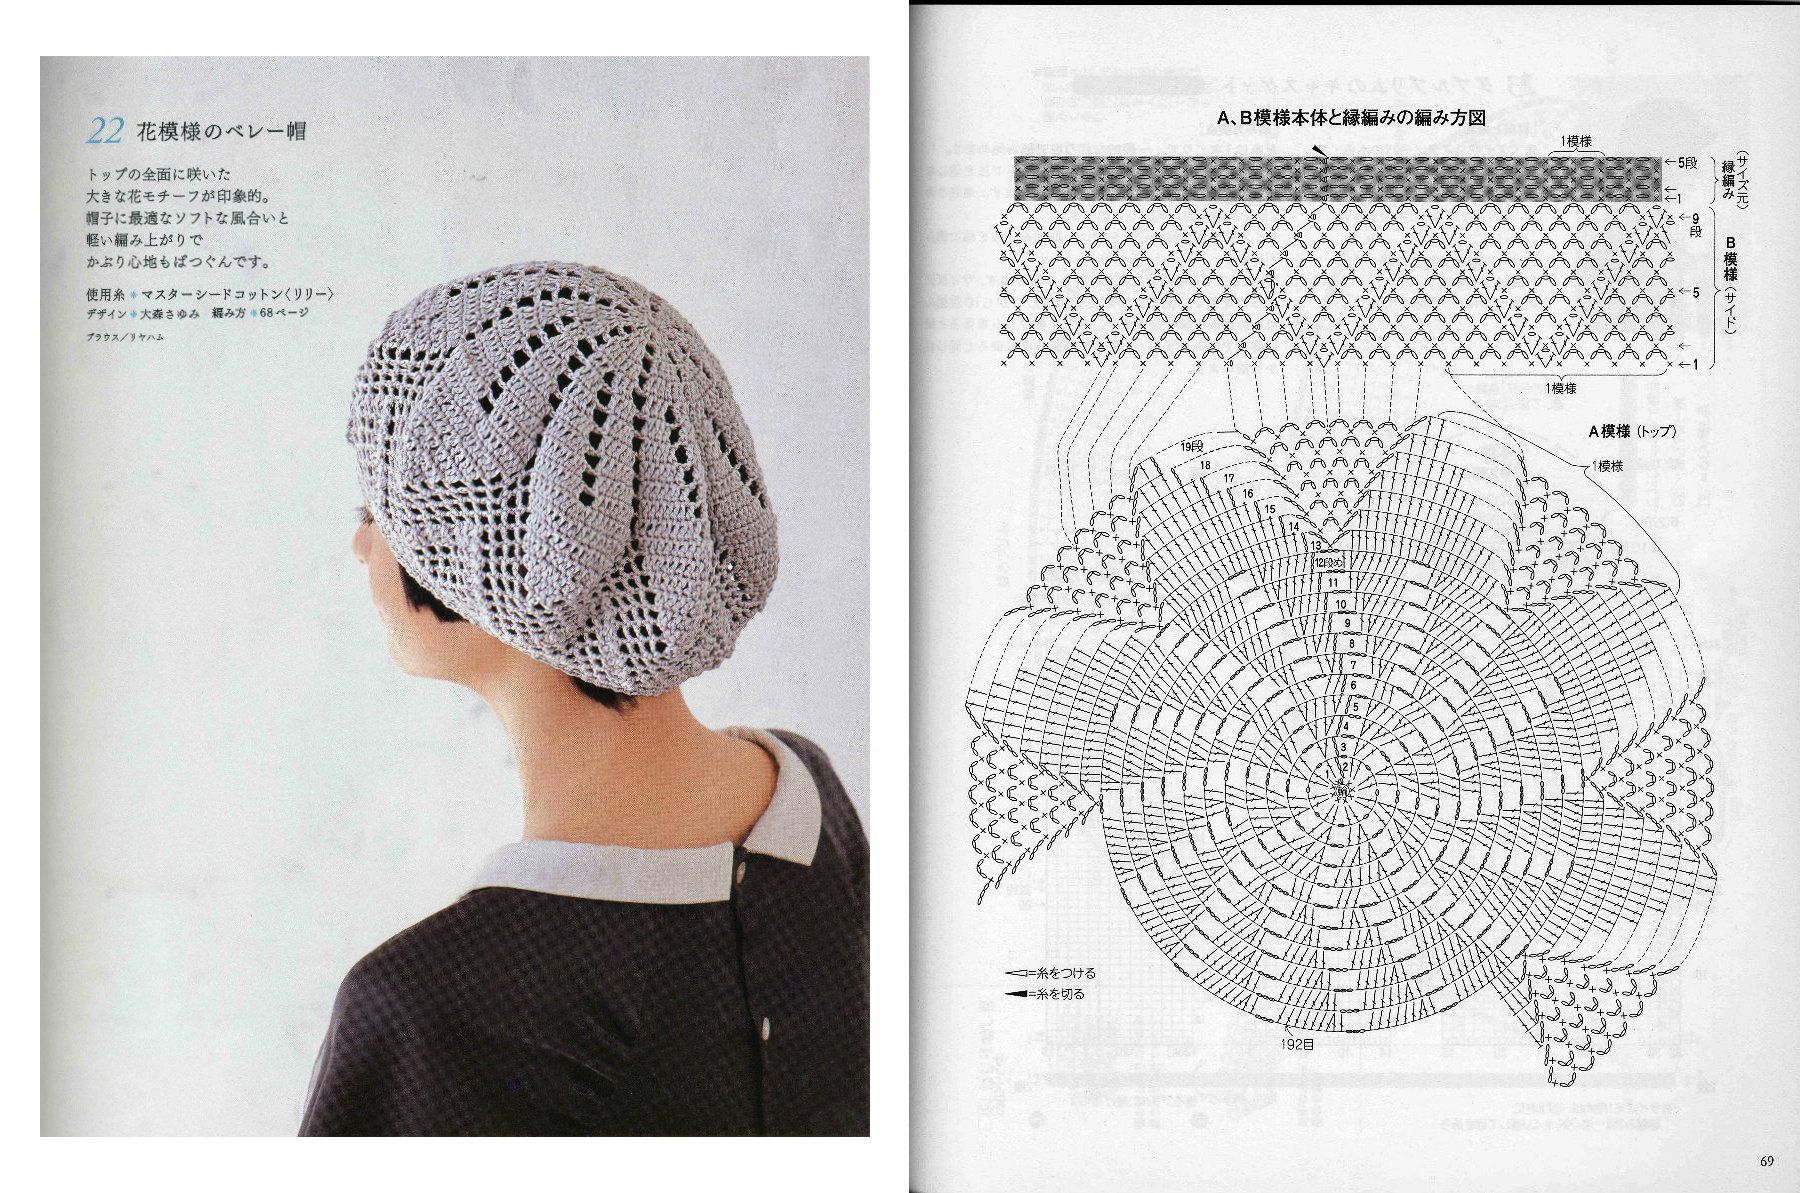 Pin by Татьяна Аверьянова on Tanzula in 2018 | Pinterest | Crochet ...